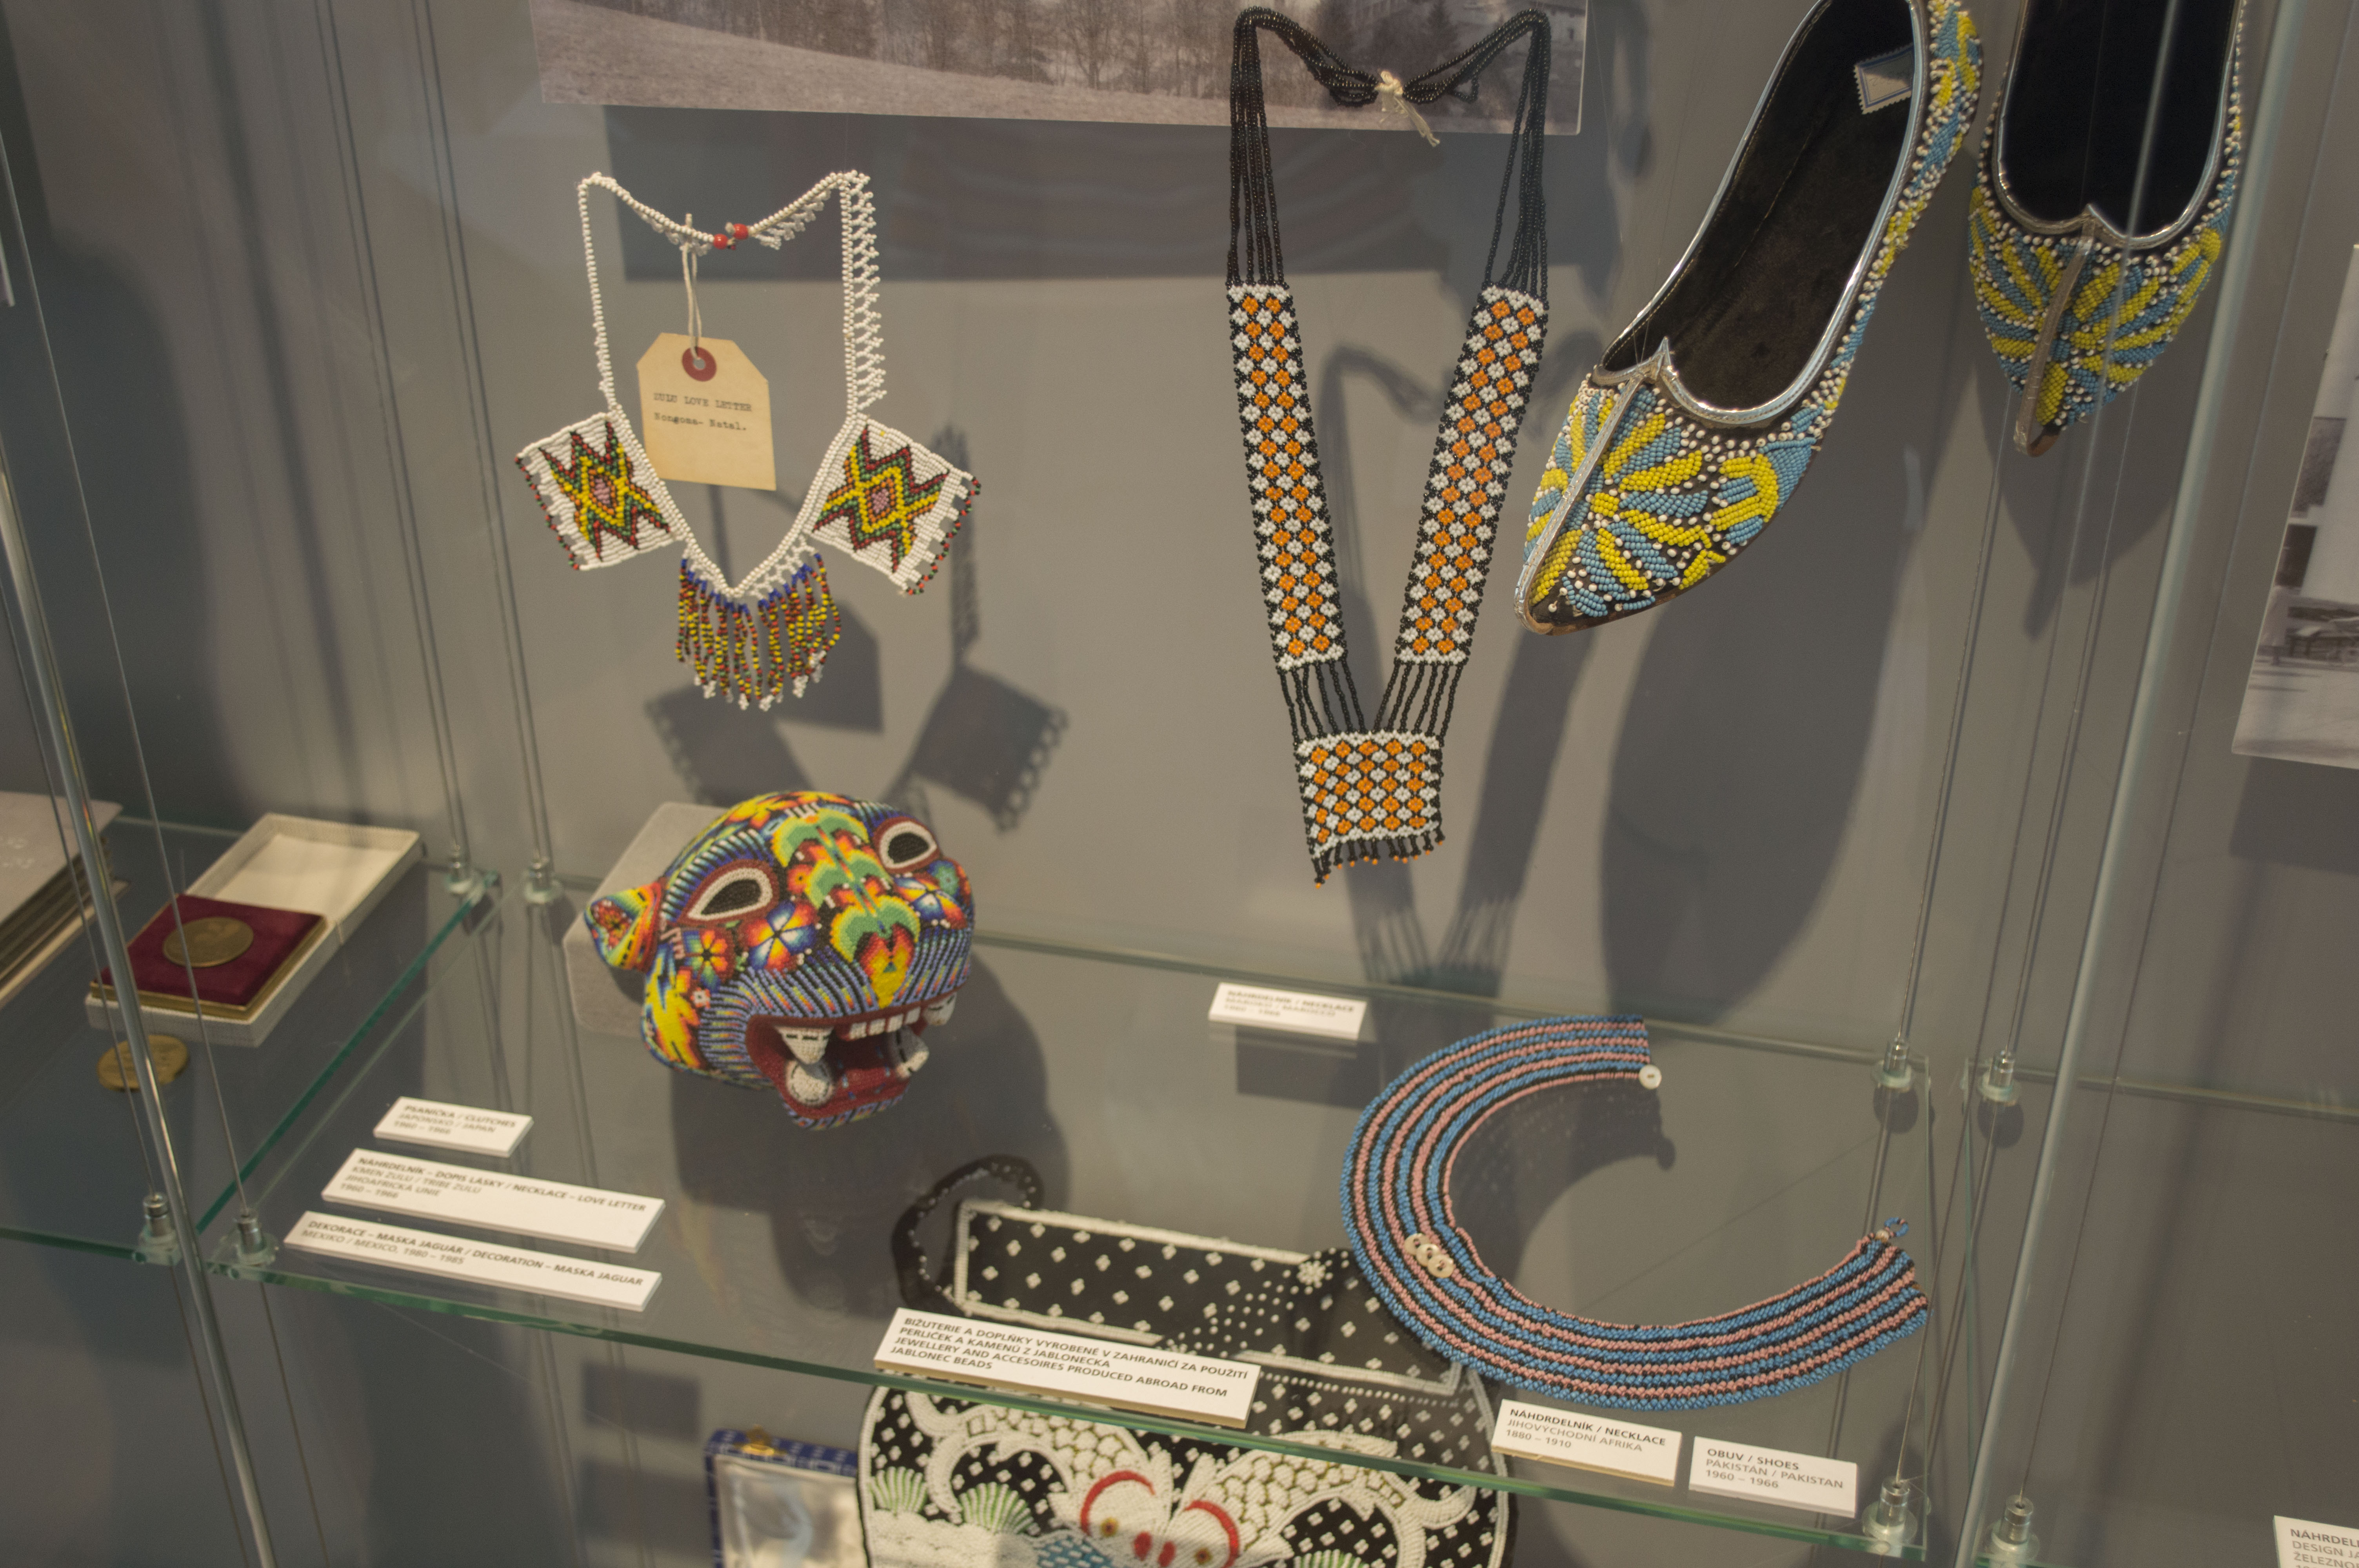 File Muzeum skla a bižuterie v Jablonci 05.jpg - Wikimedia Commons bd223b8085